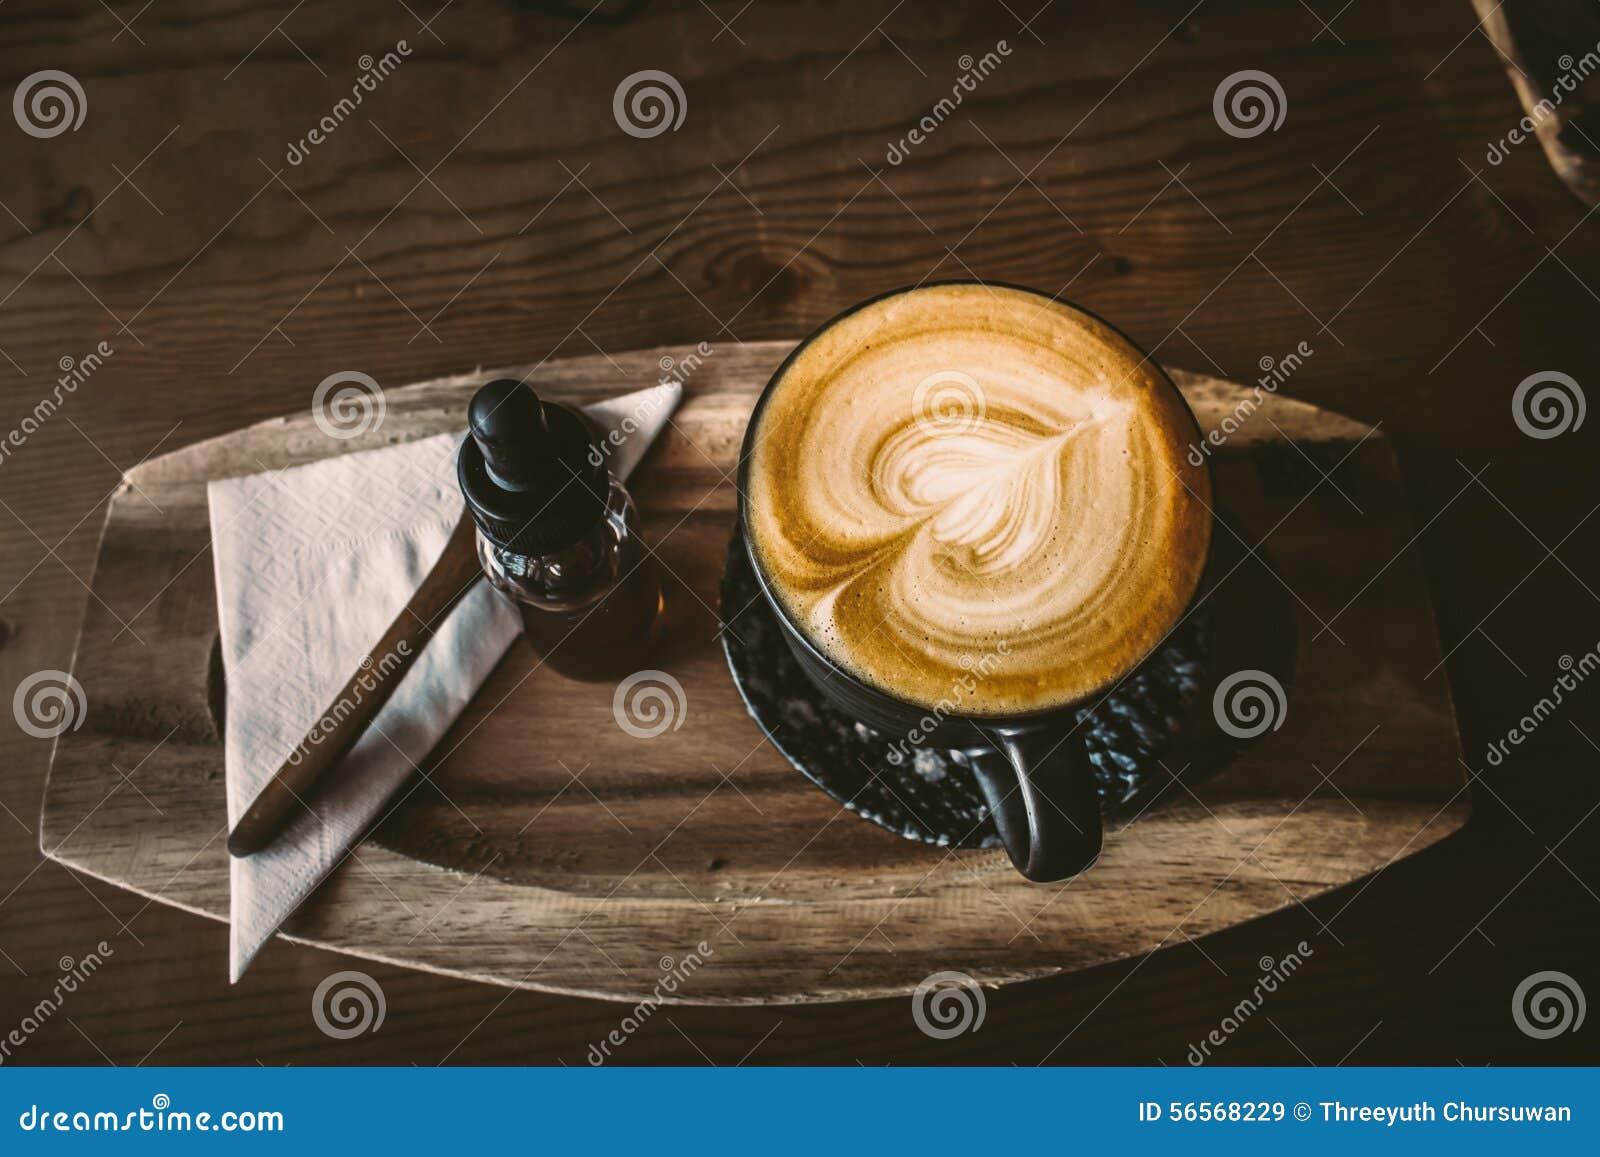 Download Τοπ μορφή καρδιών επιφάνειας άποψης φλιτζανιών του καφέ στο ξύλινο υπόβαθρο Στοκ Εικόνα - εικόνα από τρόφιμα, καυτός: 56568229